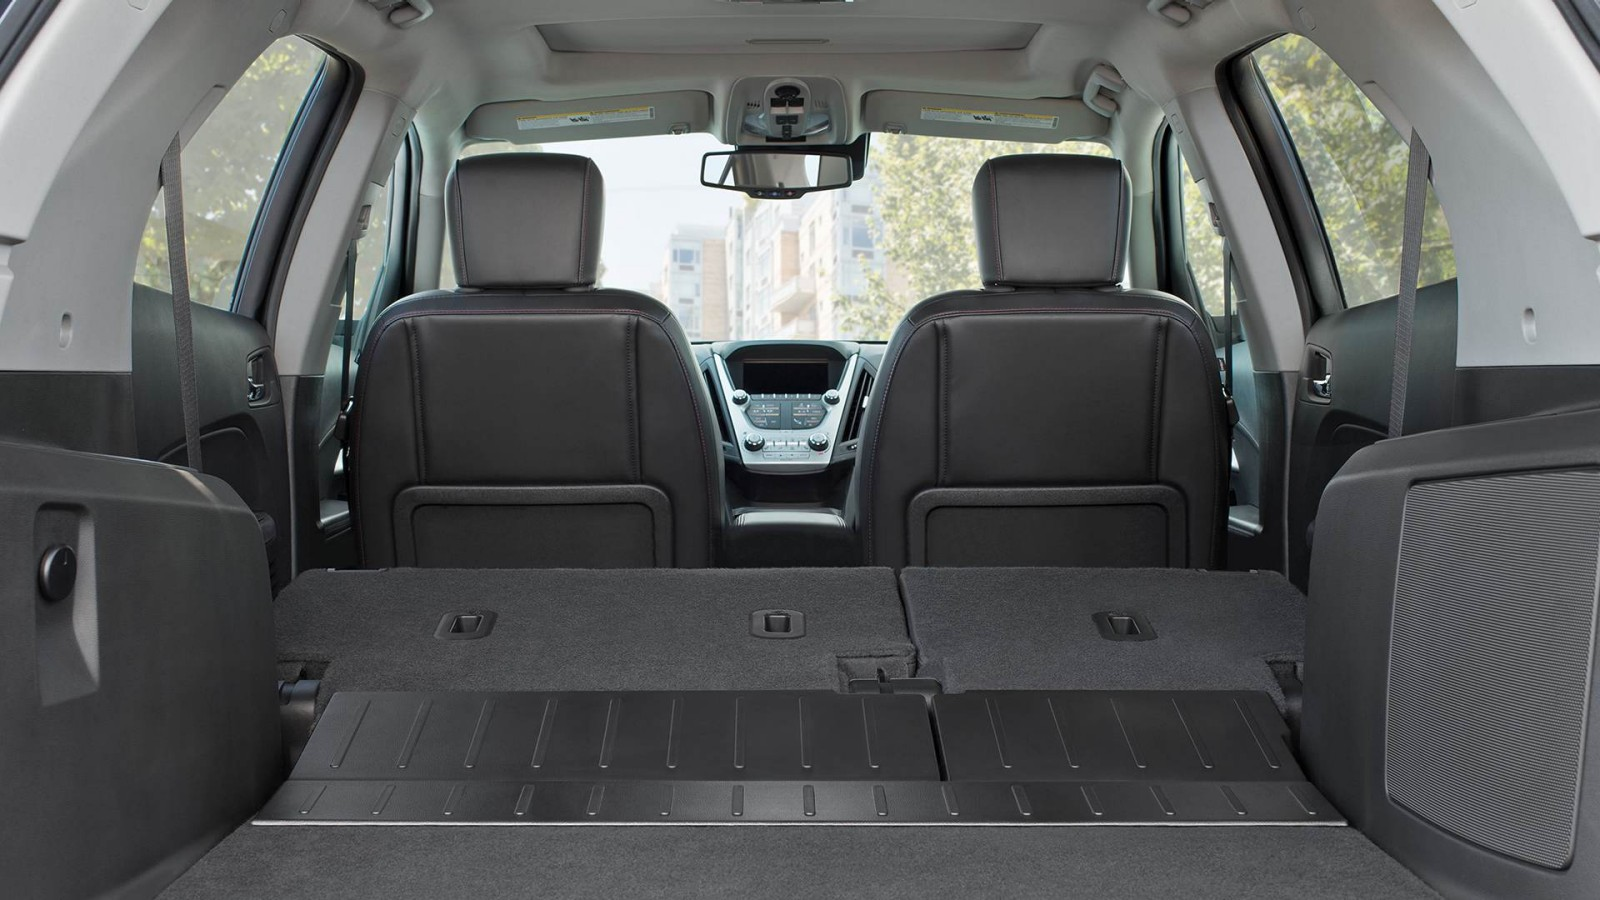 New Chevrolet Equinox Interior image 1